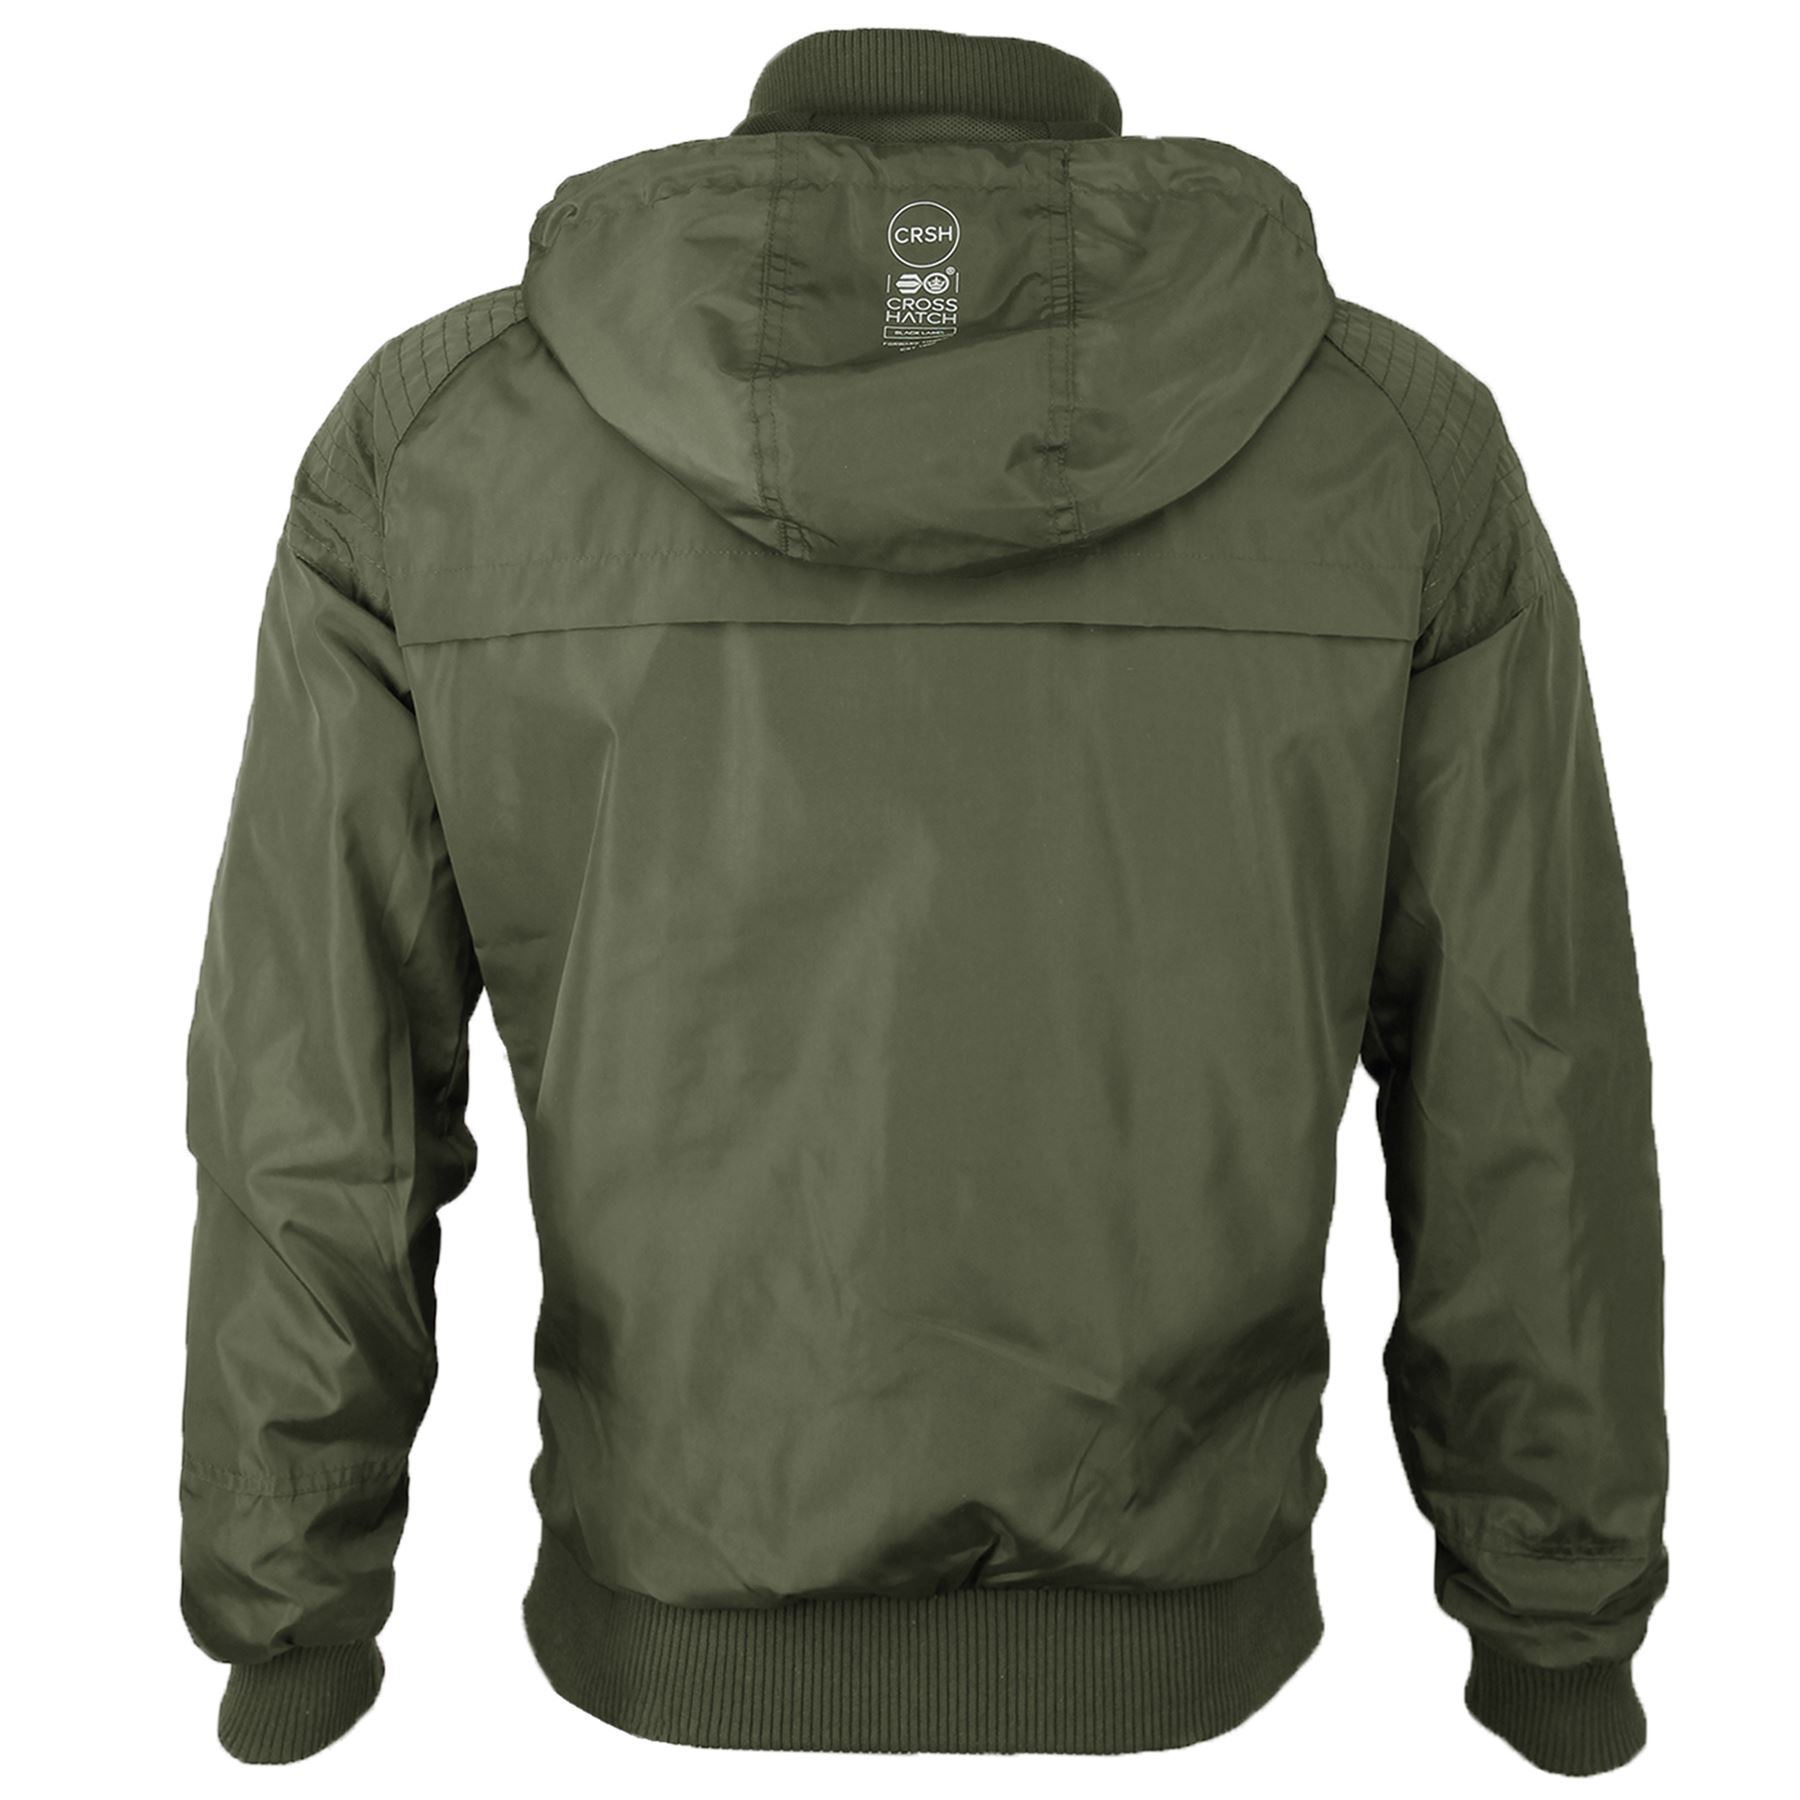 Mens Crosshatch Lightweight Contrast Showerproof Windbreaker Hooded Jacket Coat